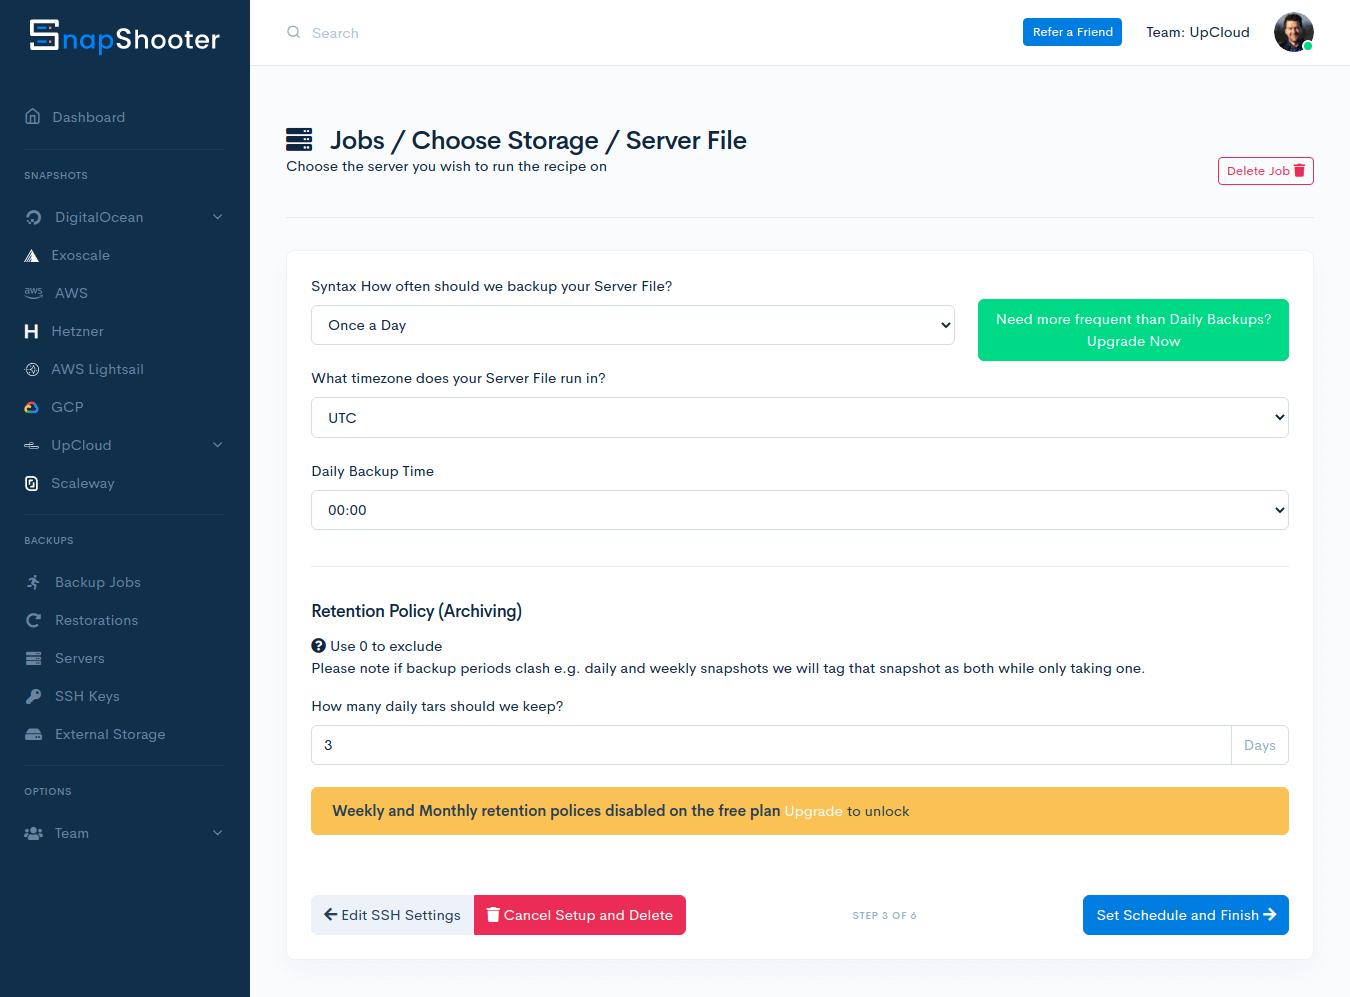 Scheduling server file backup job on SnapShooter